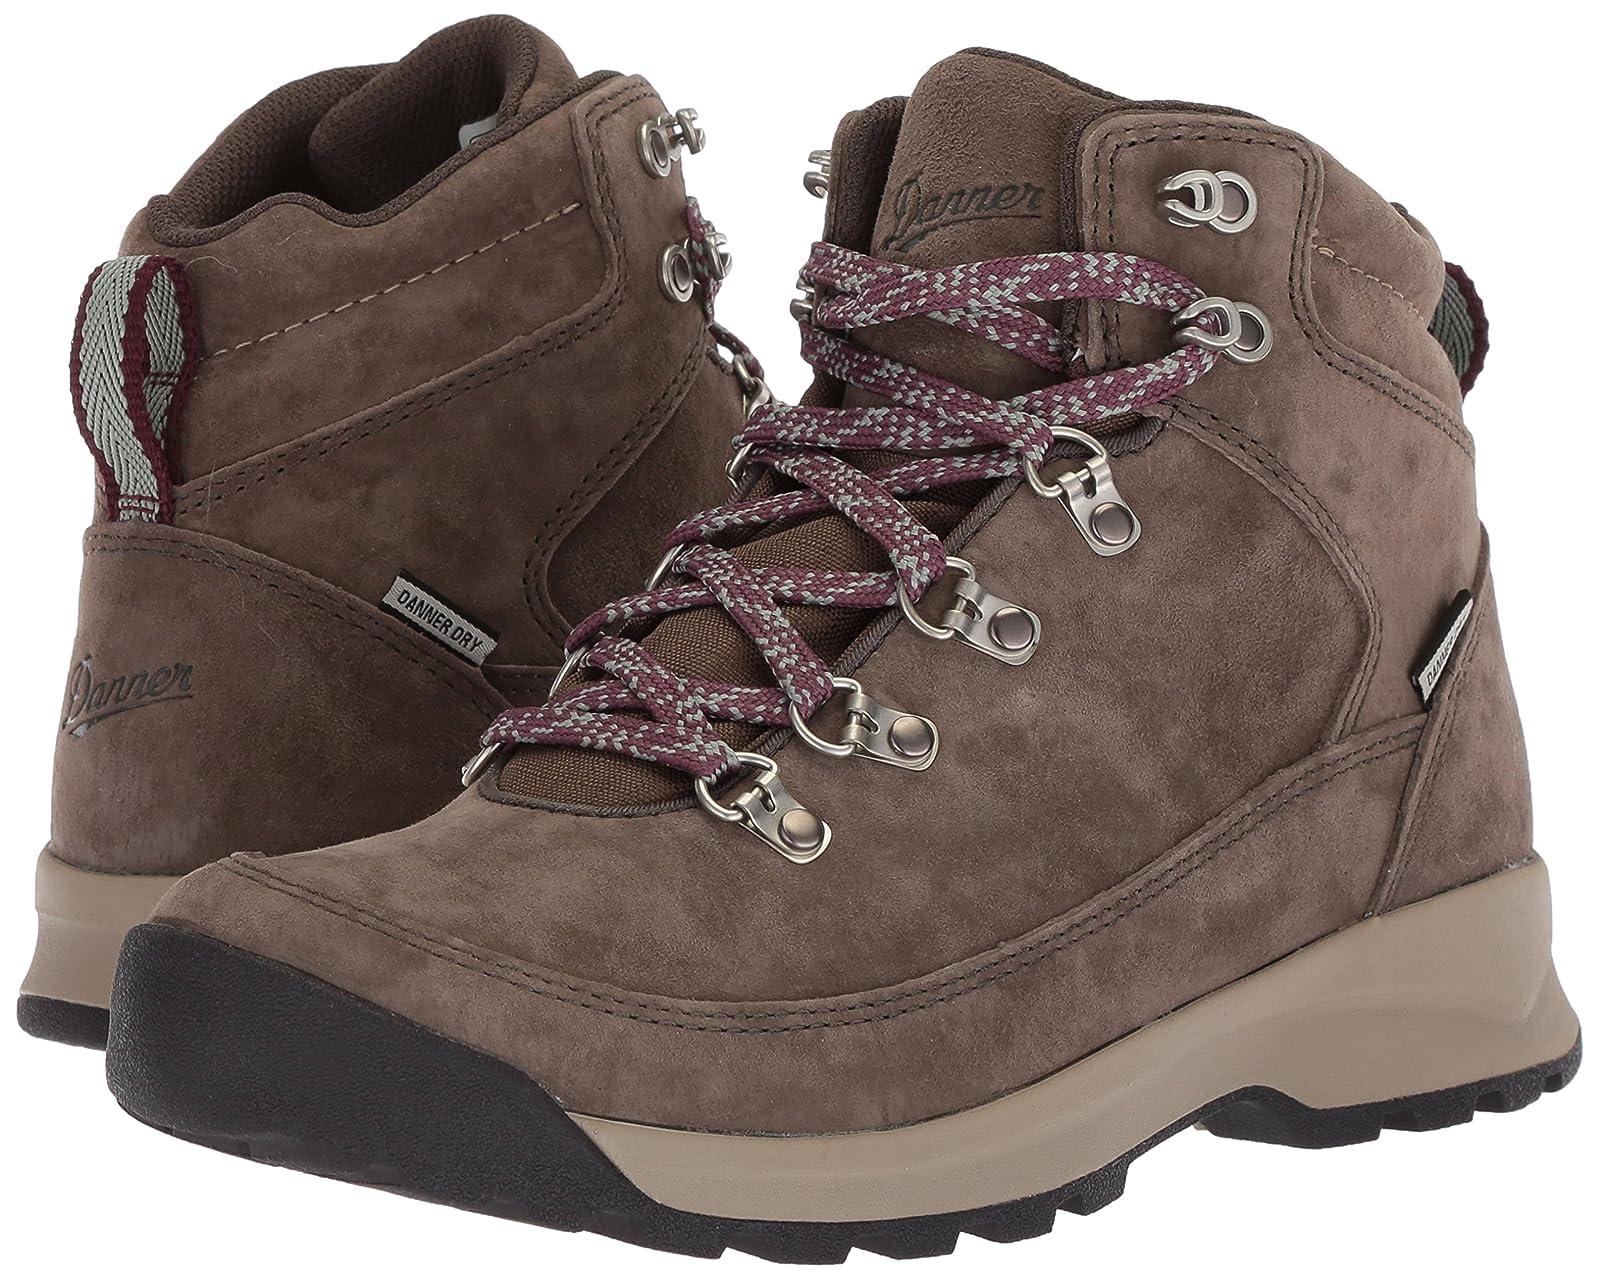 Danner Women's Adrika Hiker Hiking Boot 2 M US Boy - 6